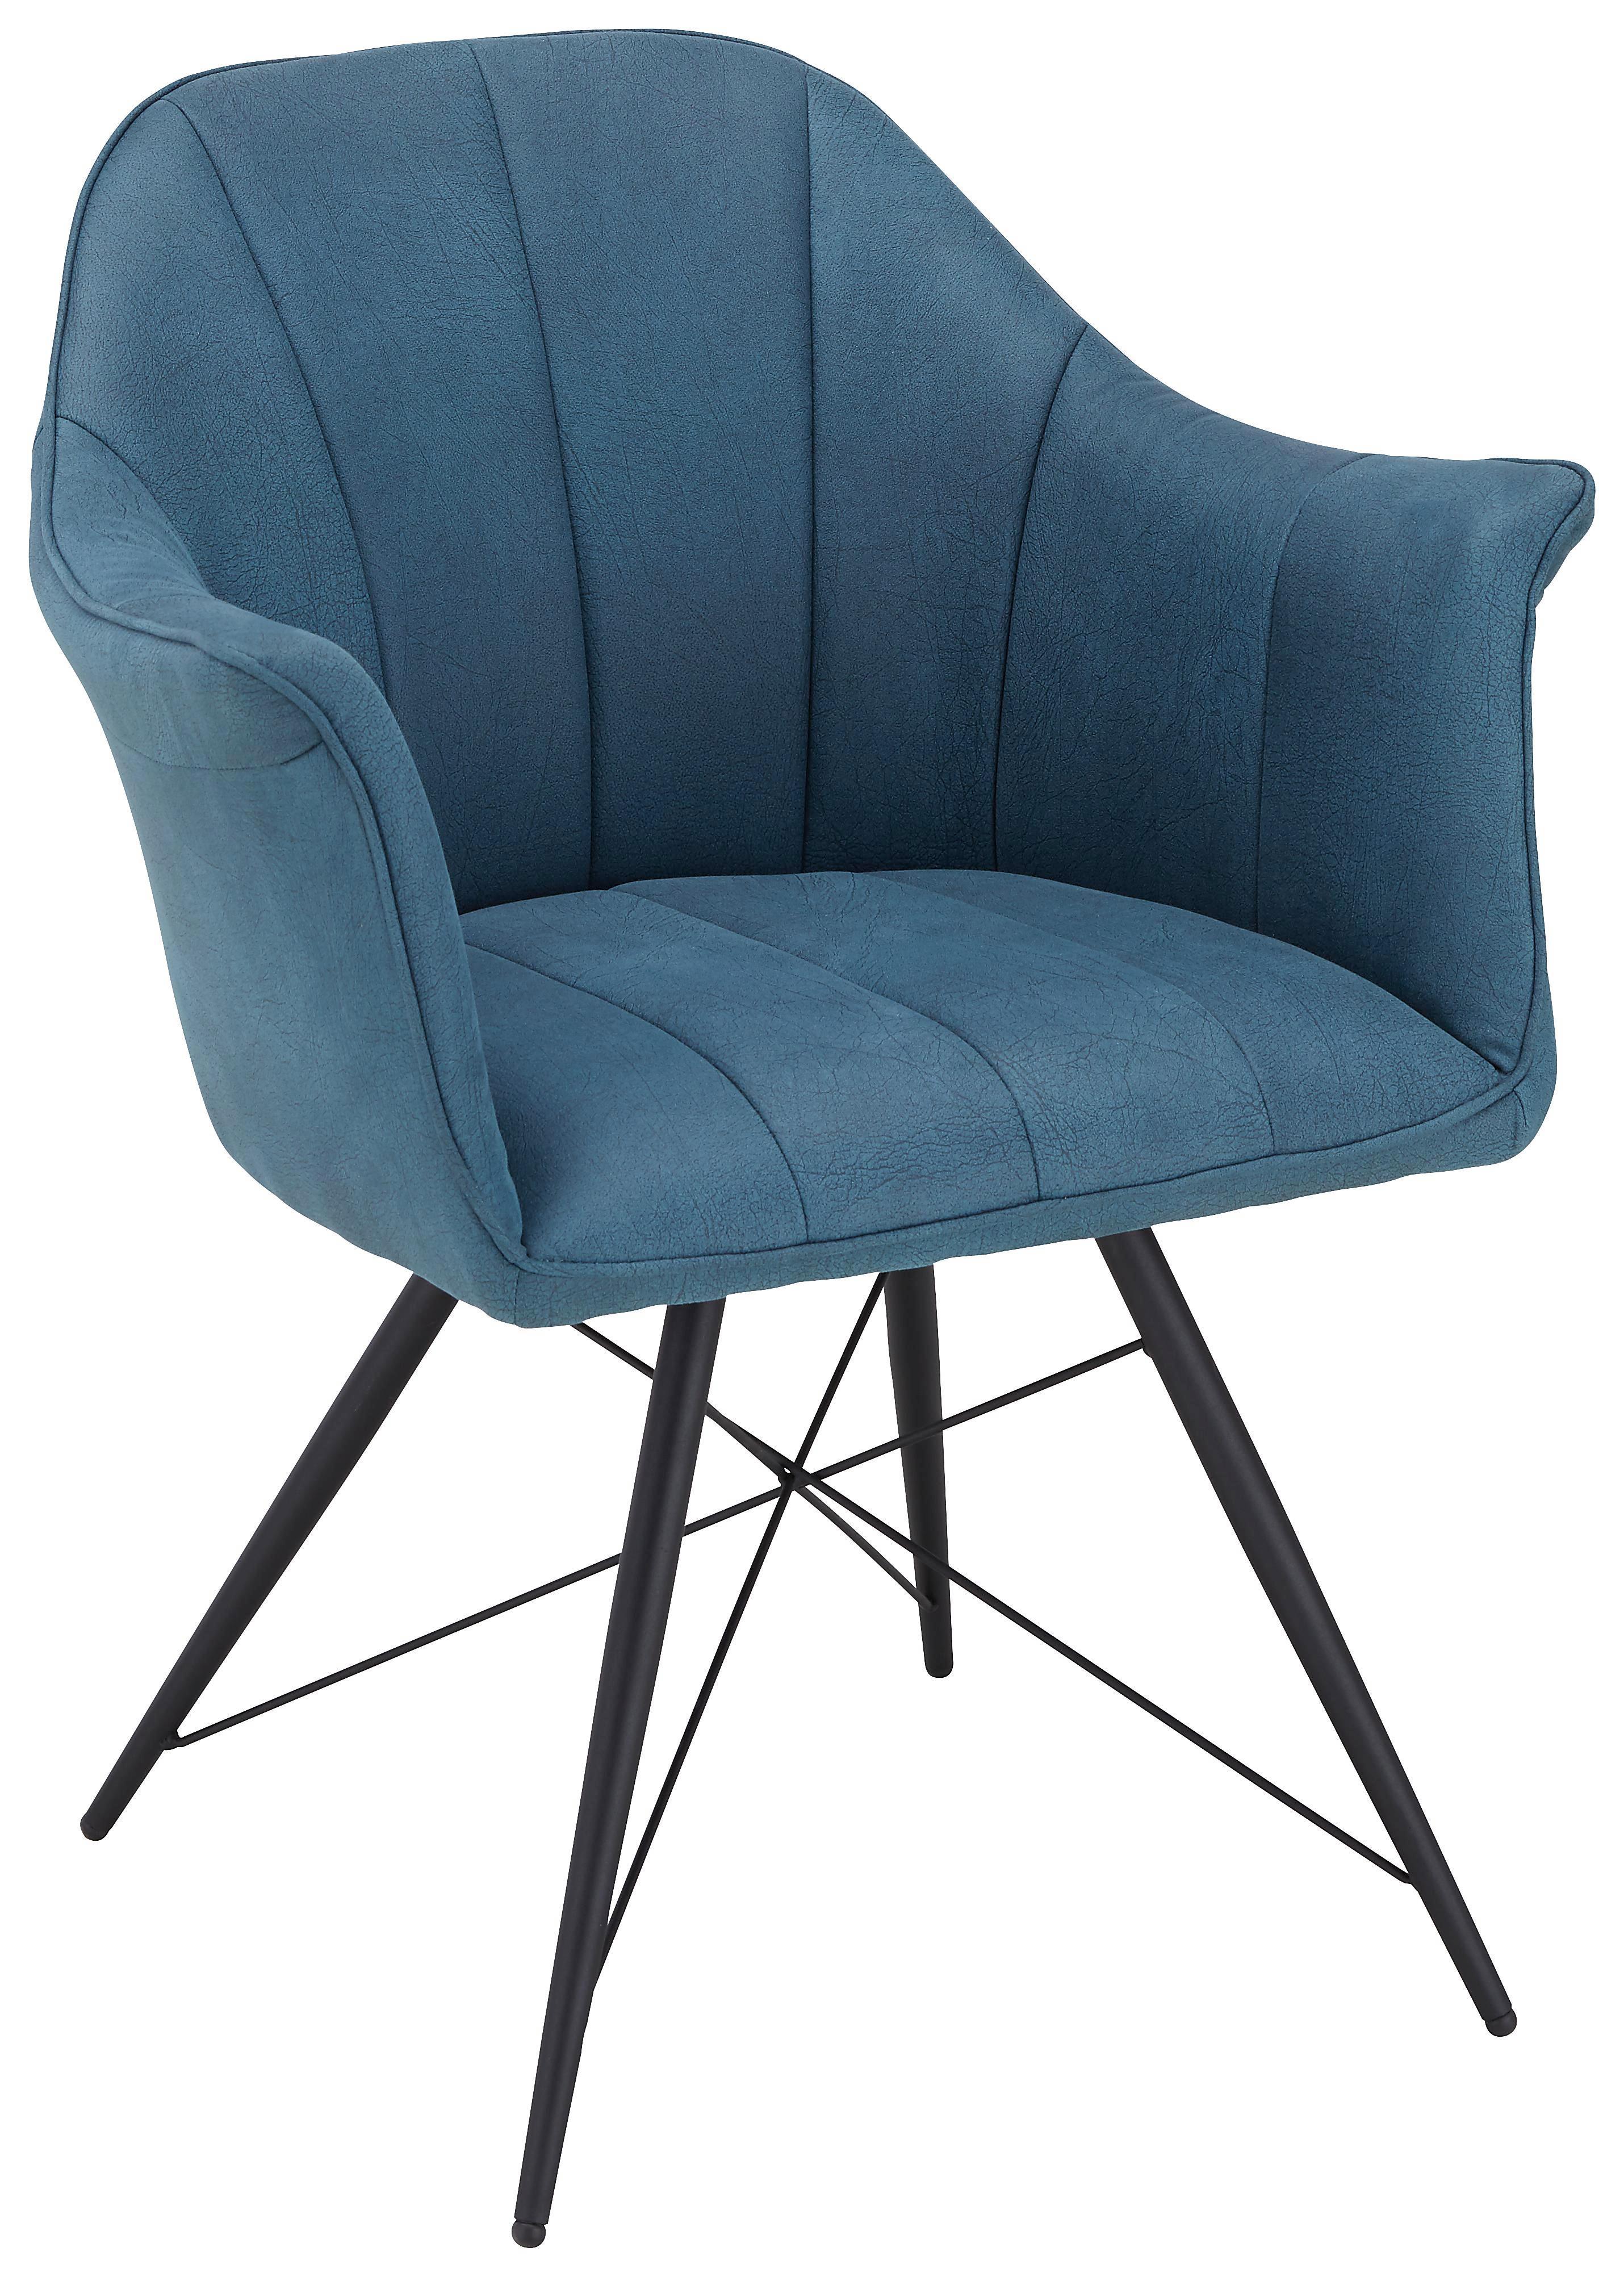 Metall Stuhl. Trendy Metall Stuhl With Metall Stuhl. Interesting ...